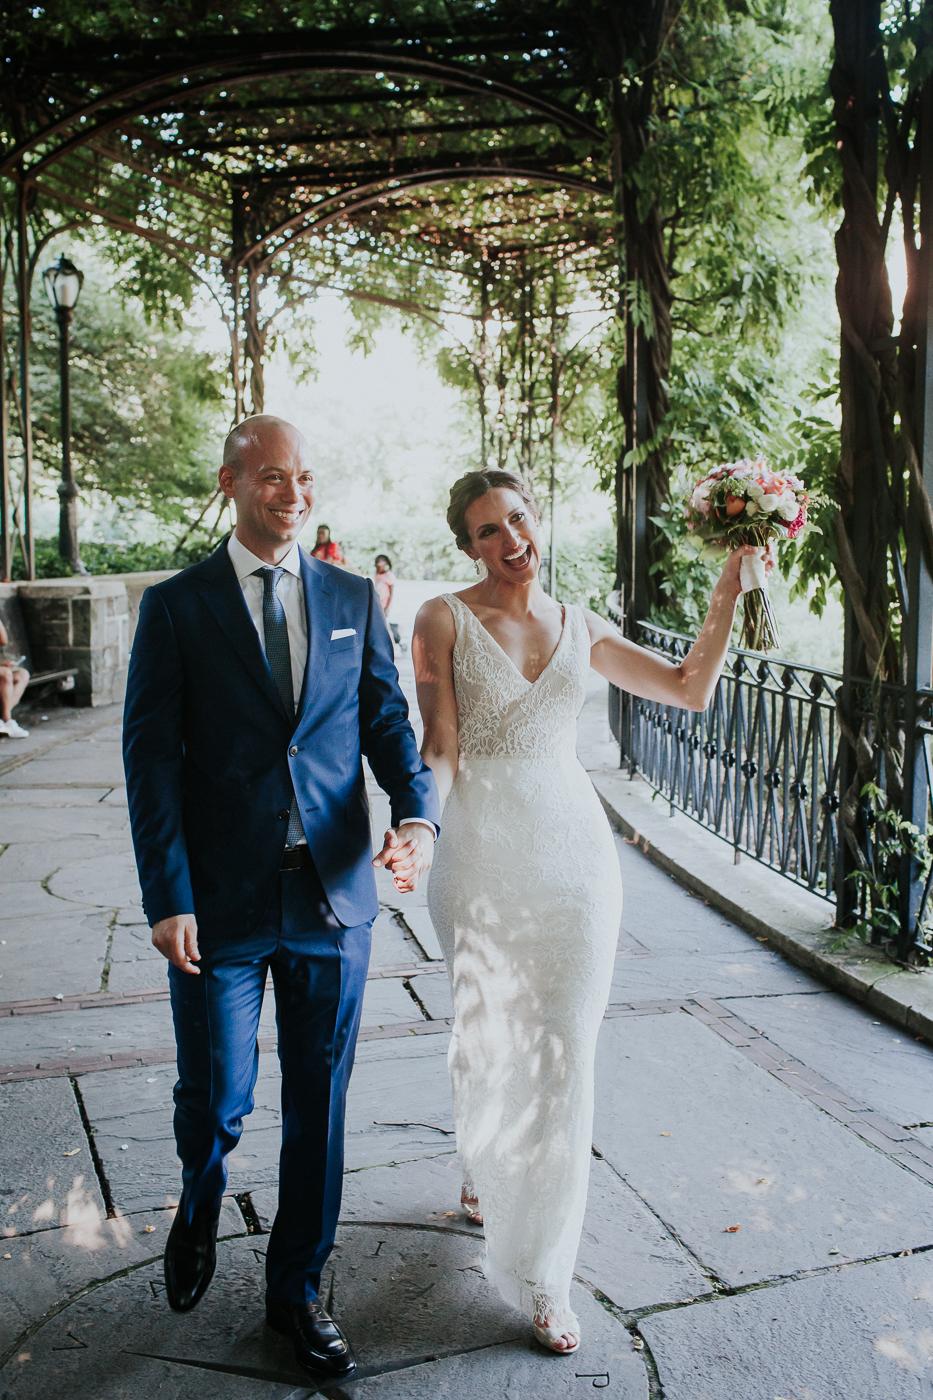 NYC-Central-Park-Conservatory-Garden-Intimate-Elopement-Documentary-Wedding-Photographer-30.jpg